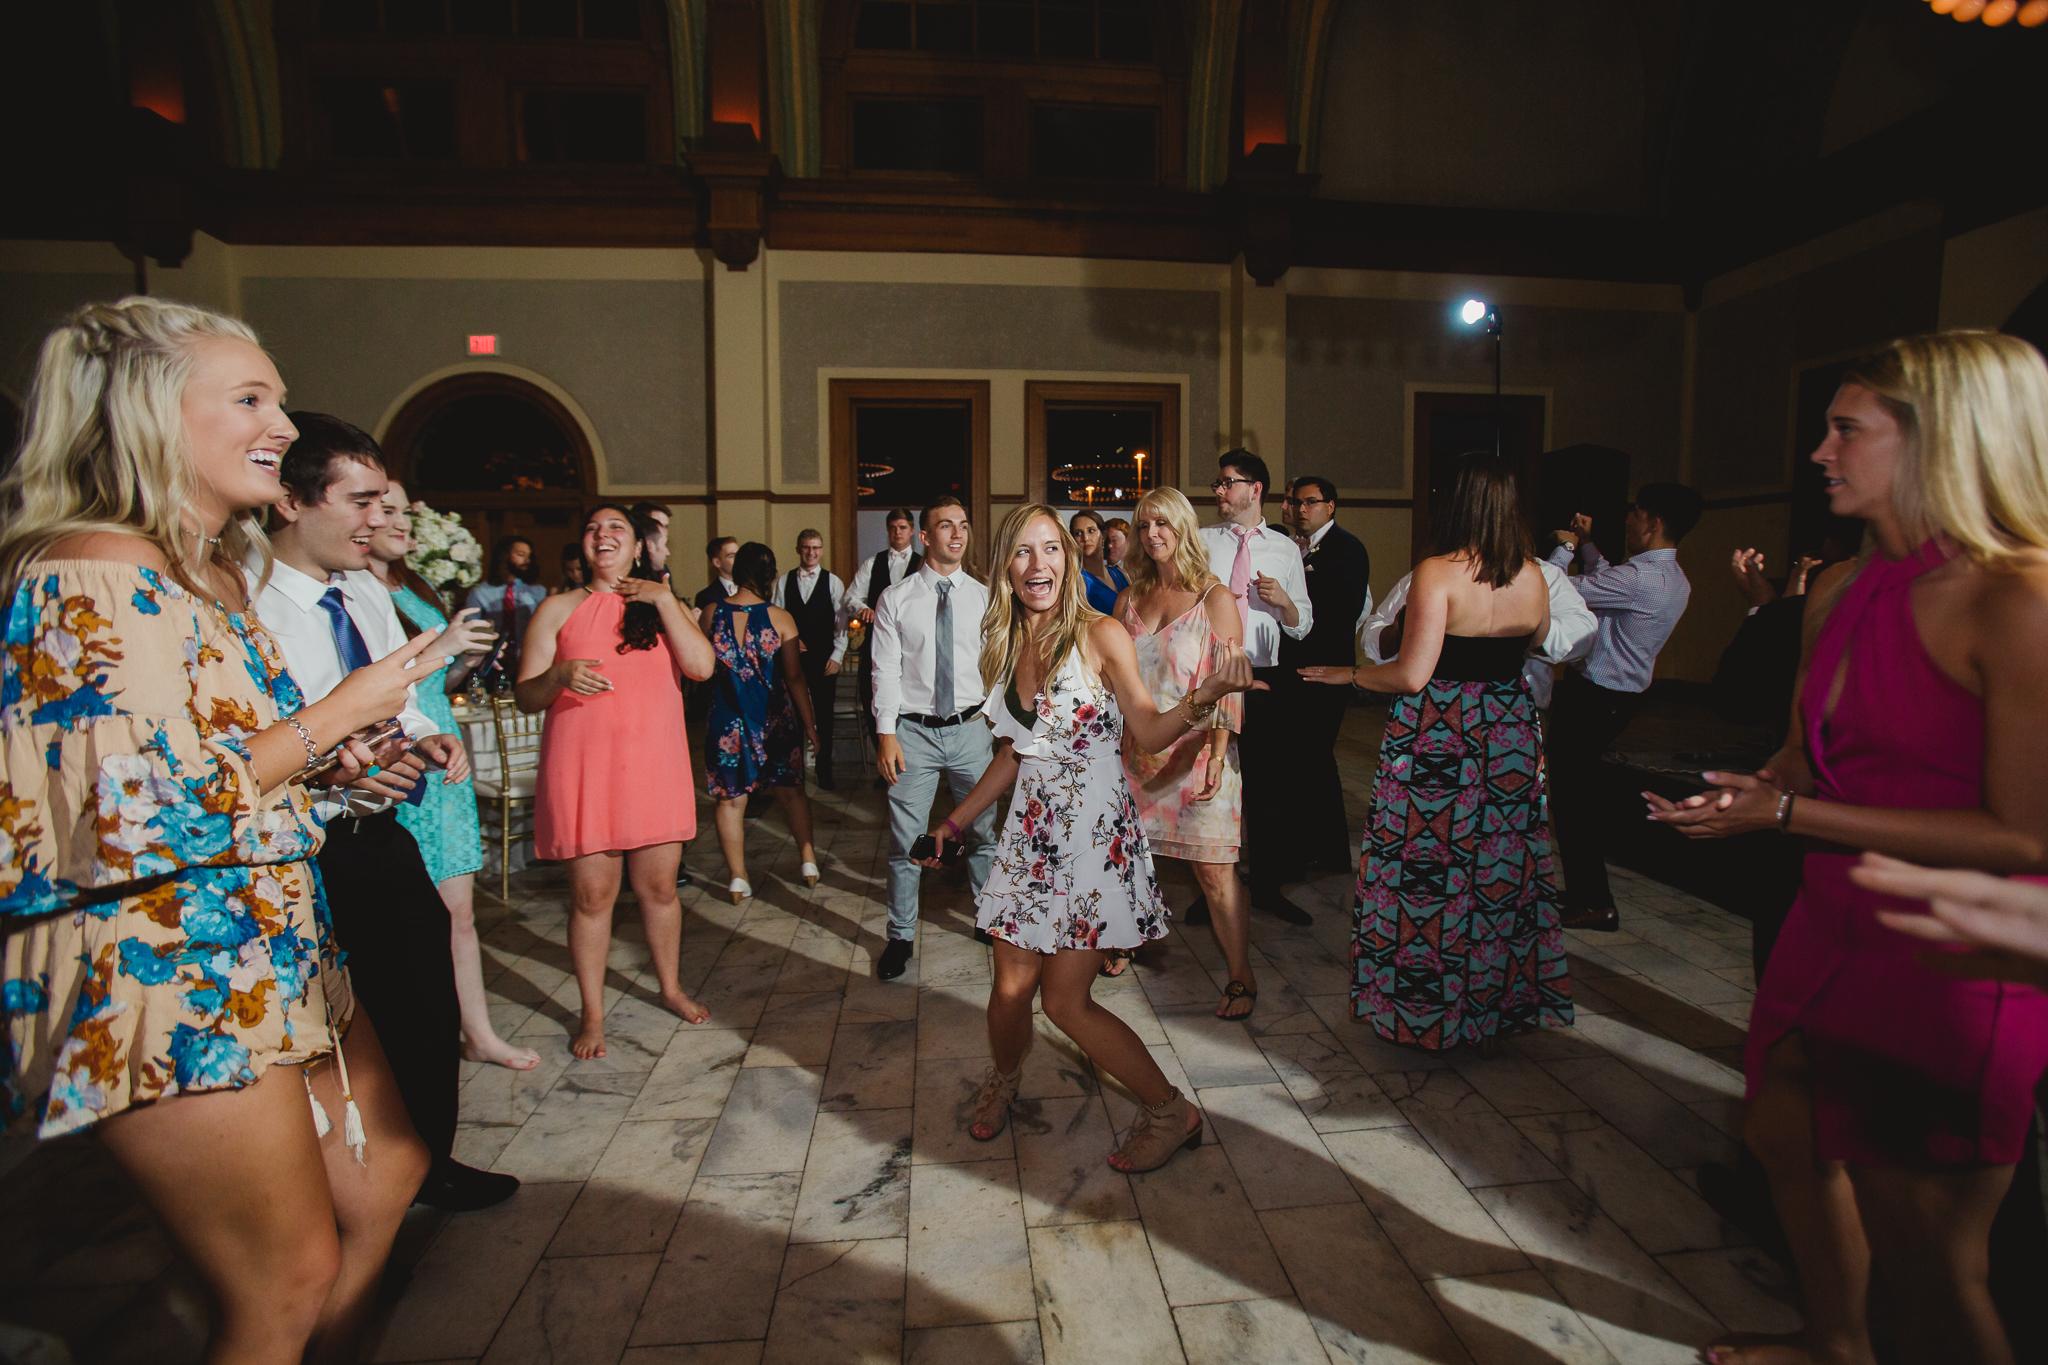 Michael and Kelly - the ashton depot - wedding DFW - wedding photographer- elizalde photography (130 of 150).jpg